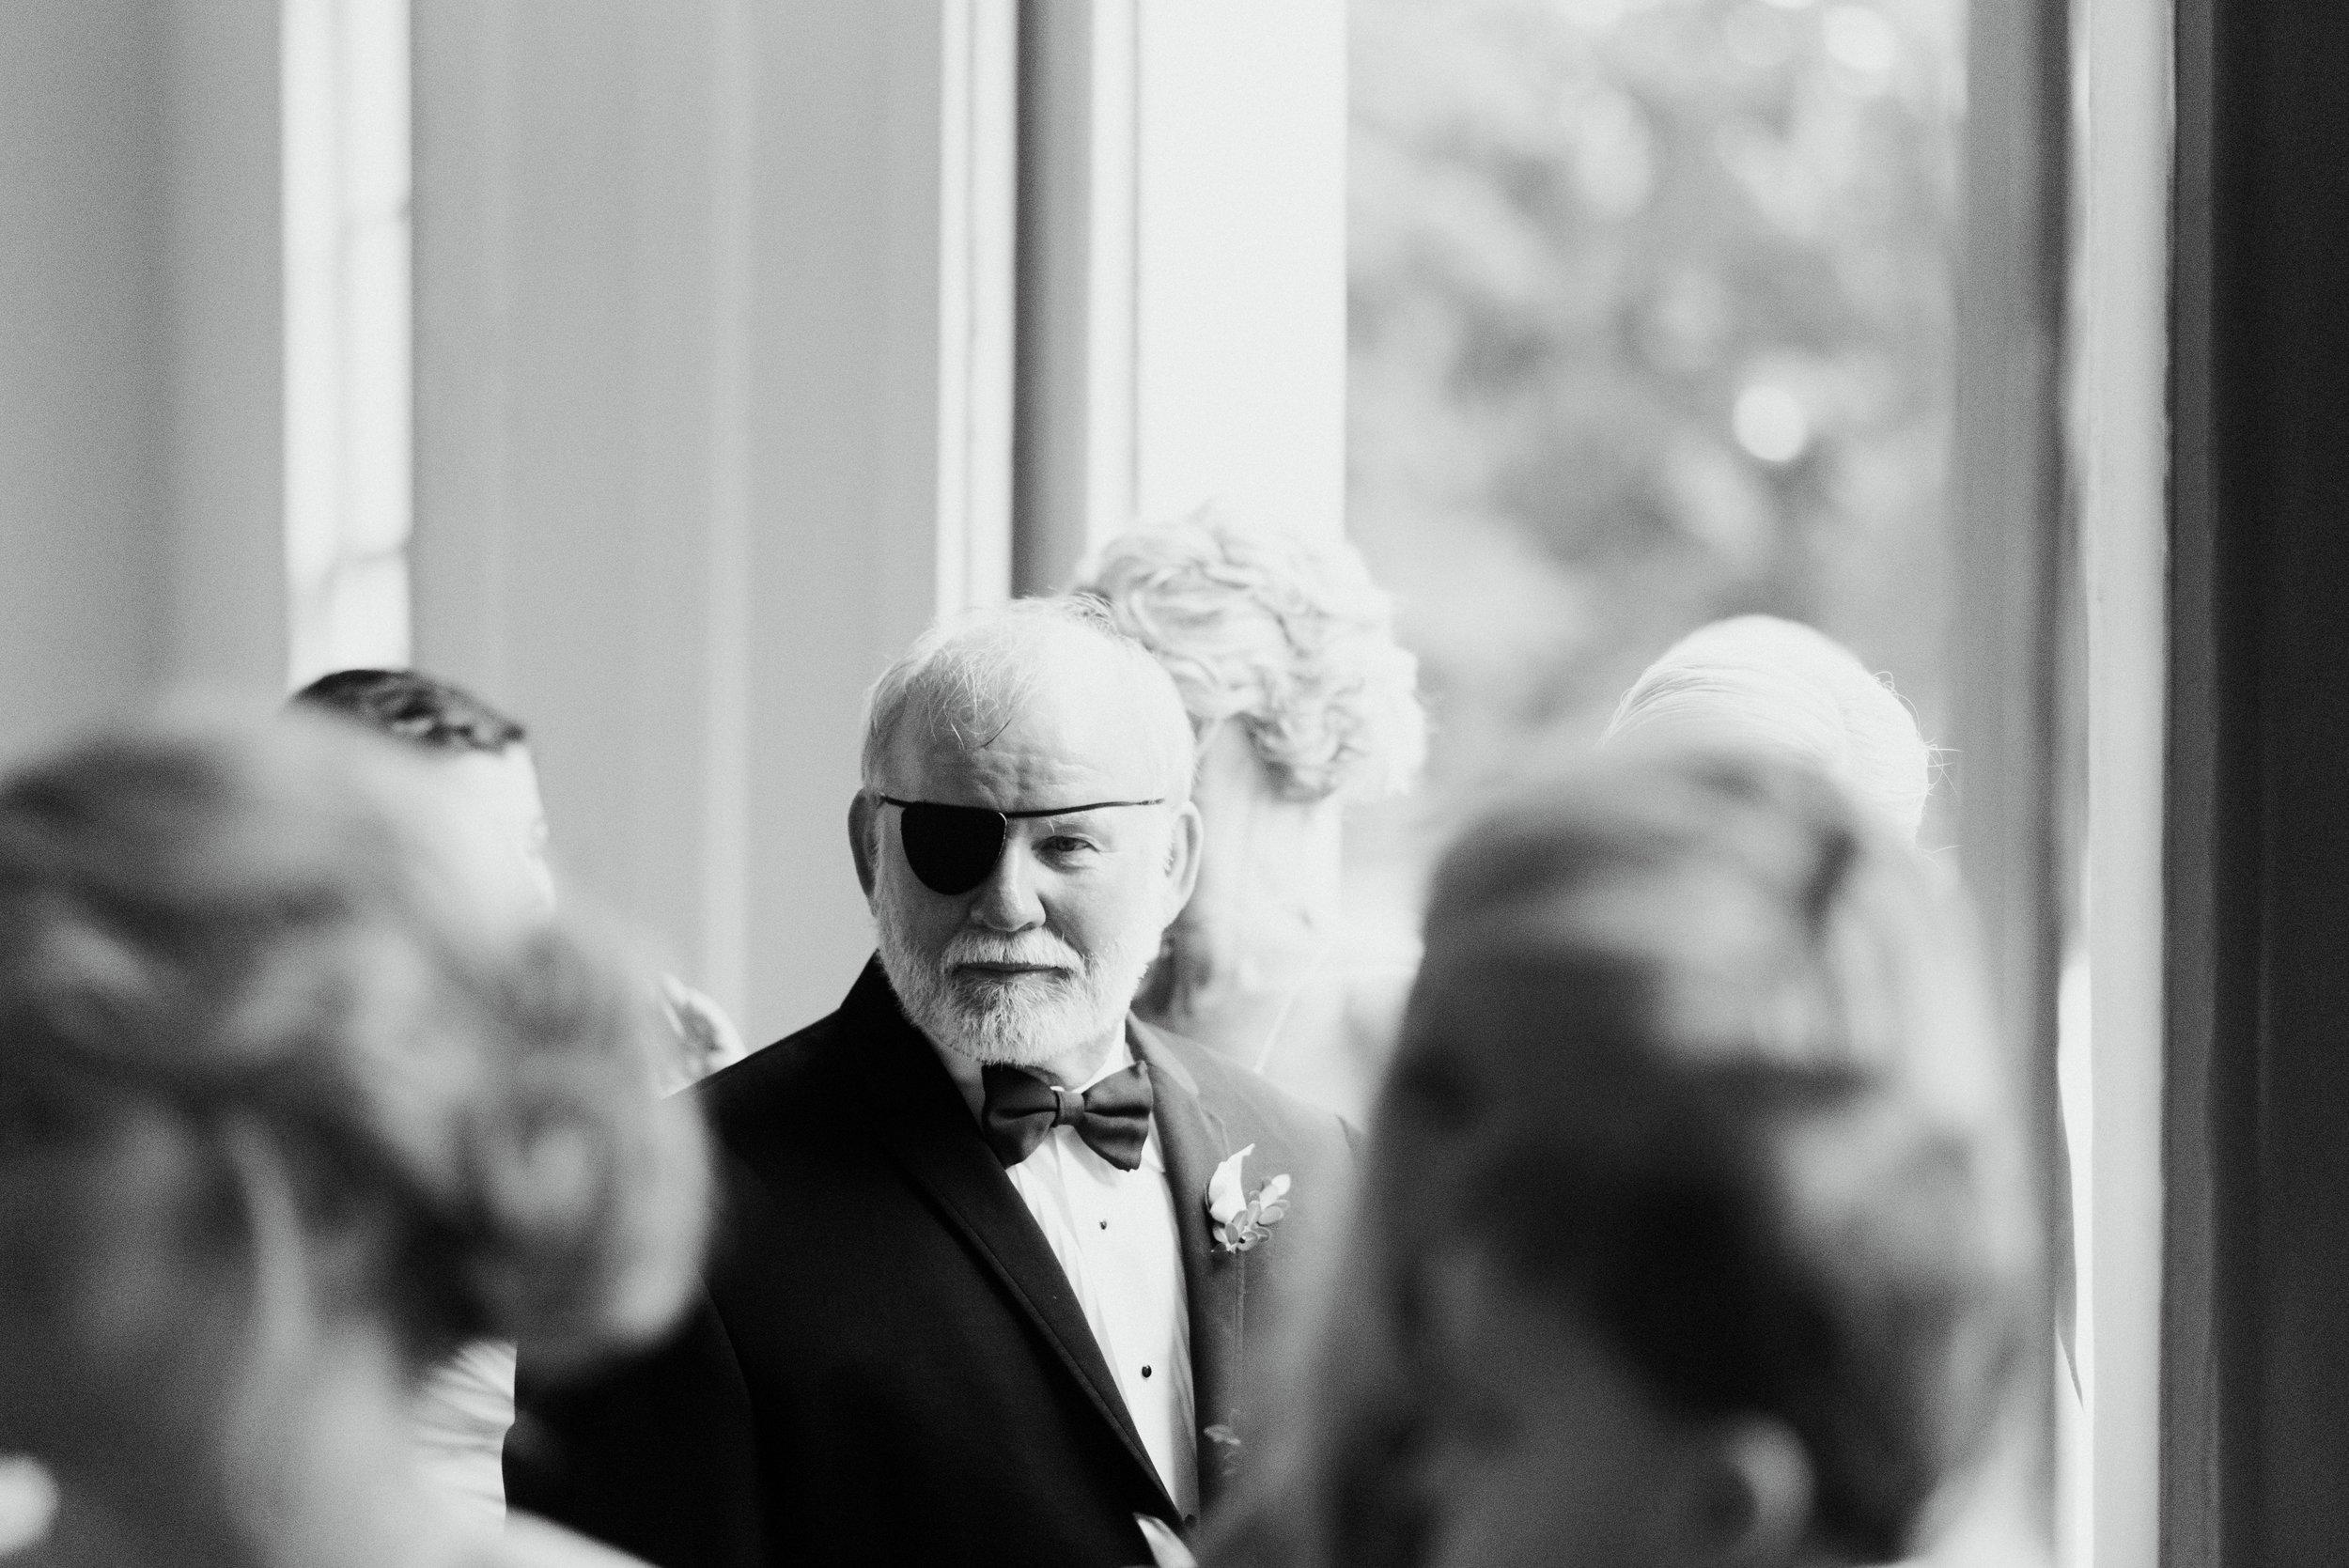 ali-and-jared-savannah-georgia-may-2017-wedding-meg-hill-photo-(252of760).jpg